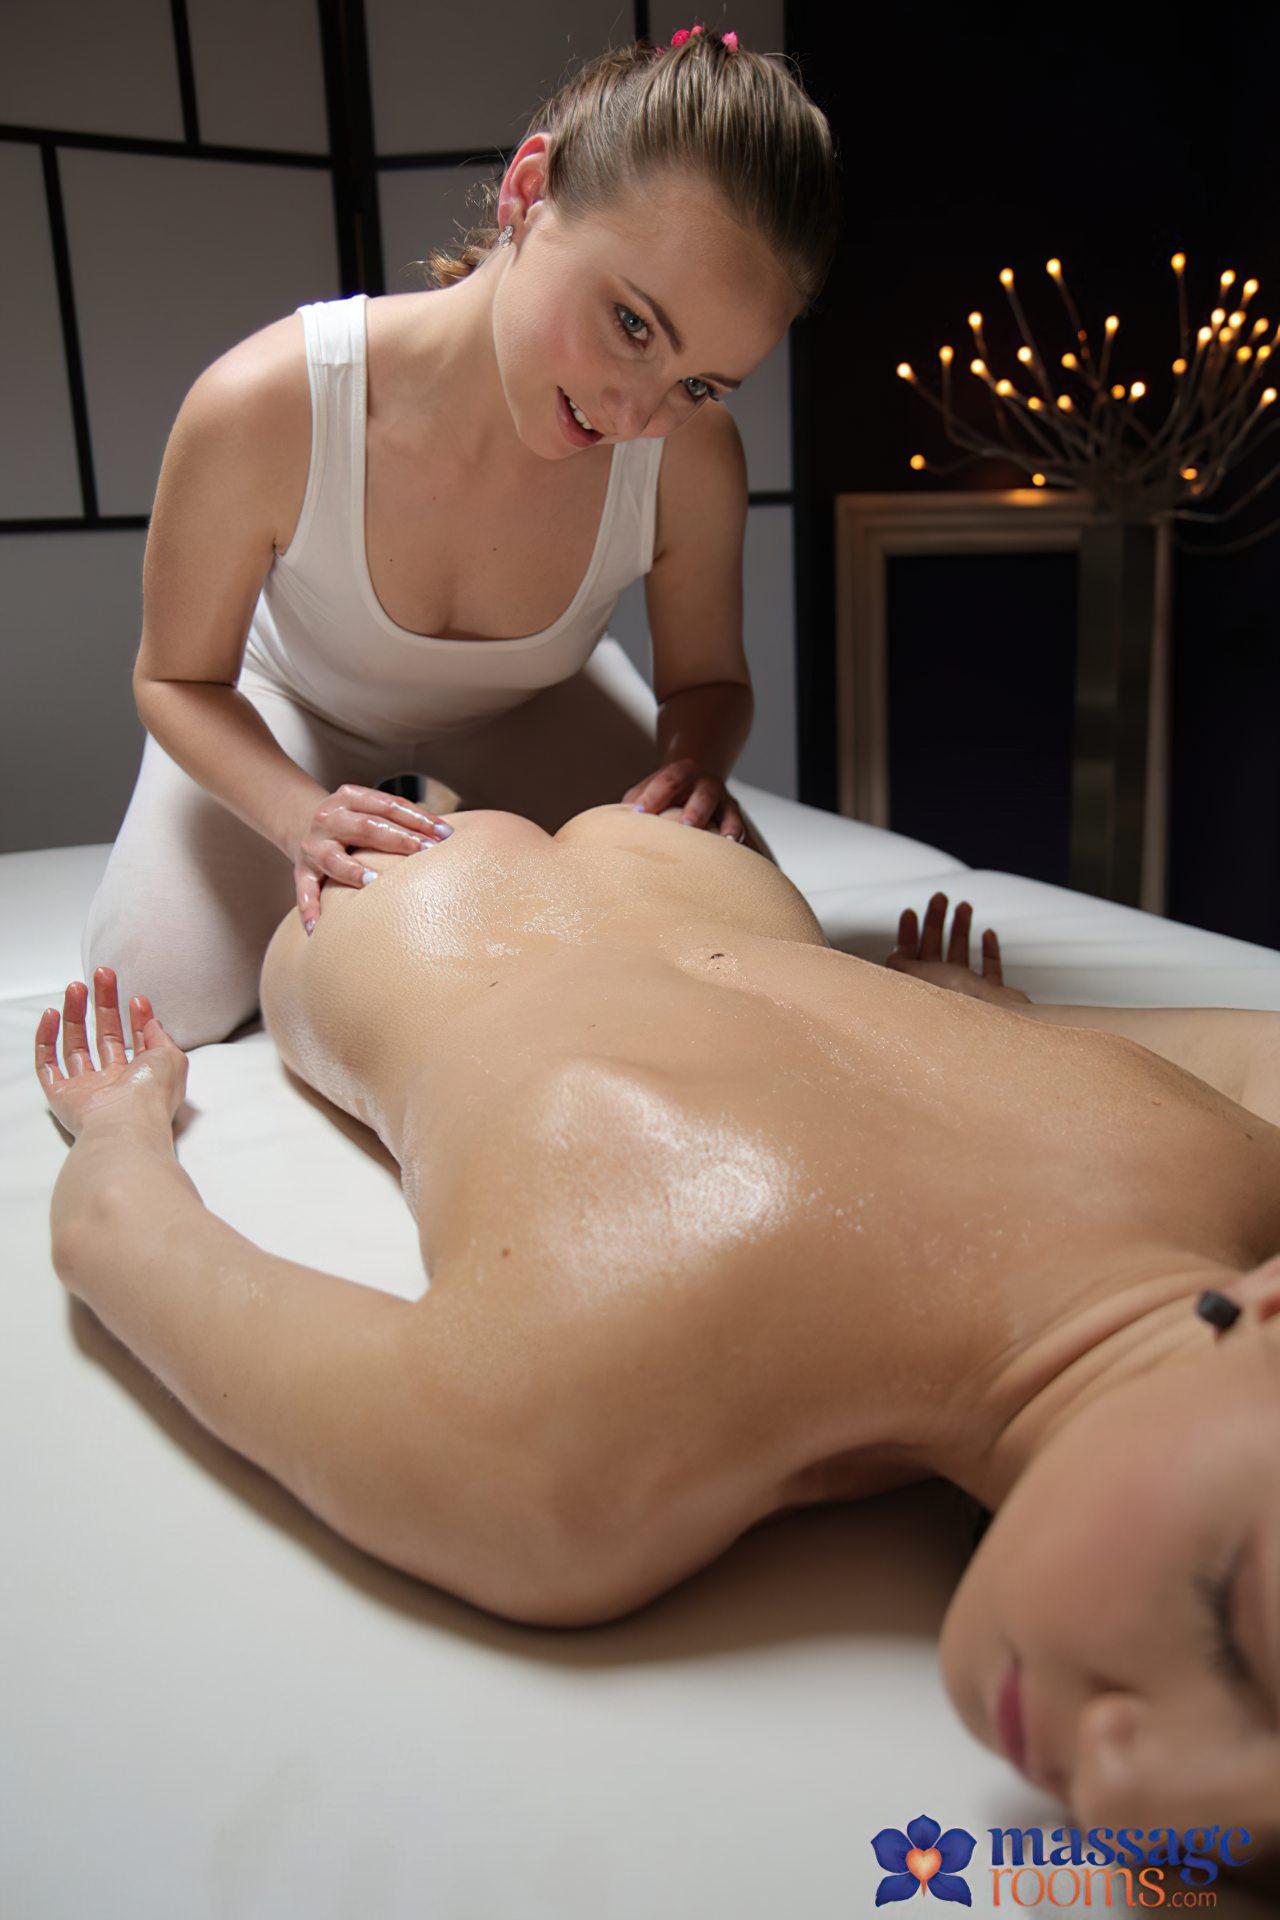 Lesbica Massagem Amiga (13)